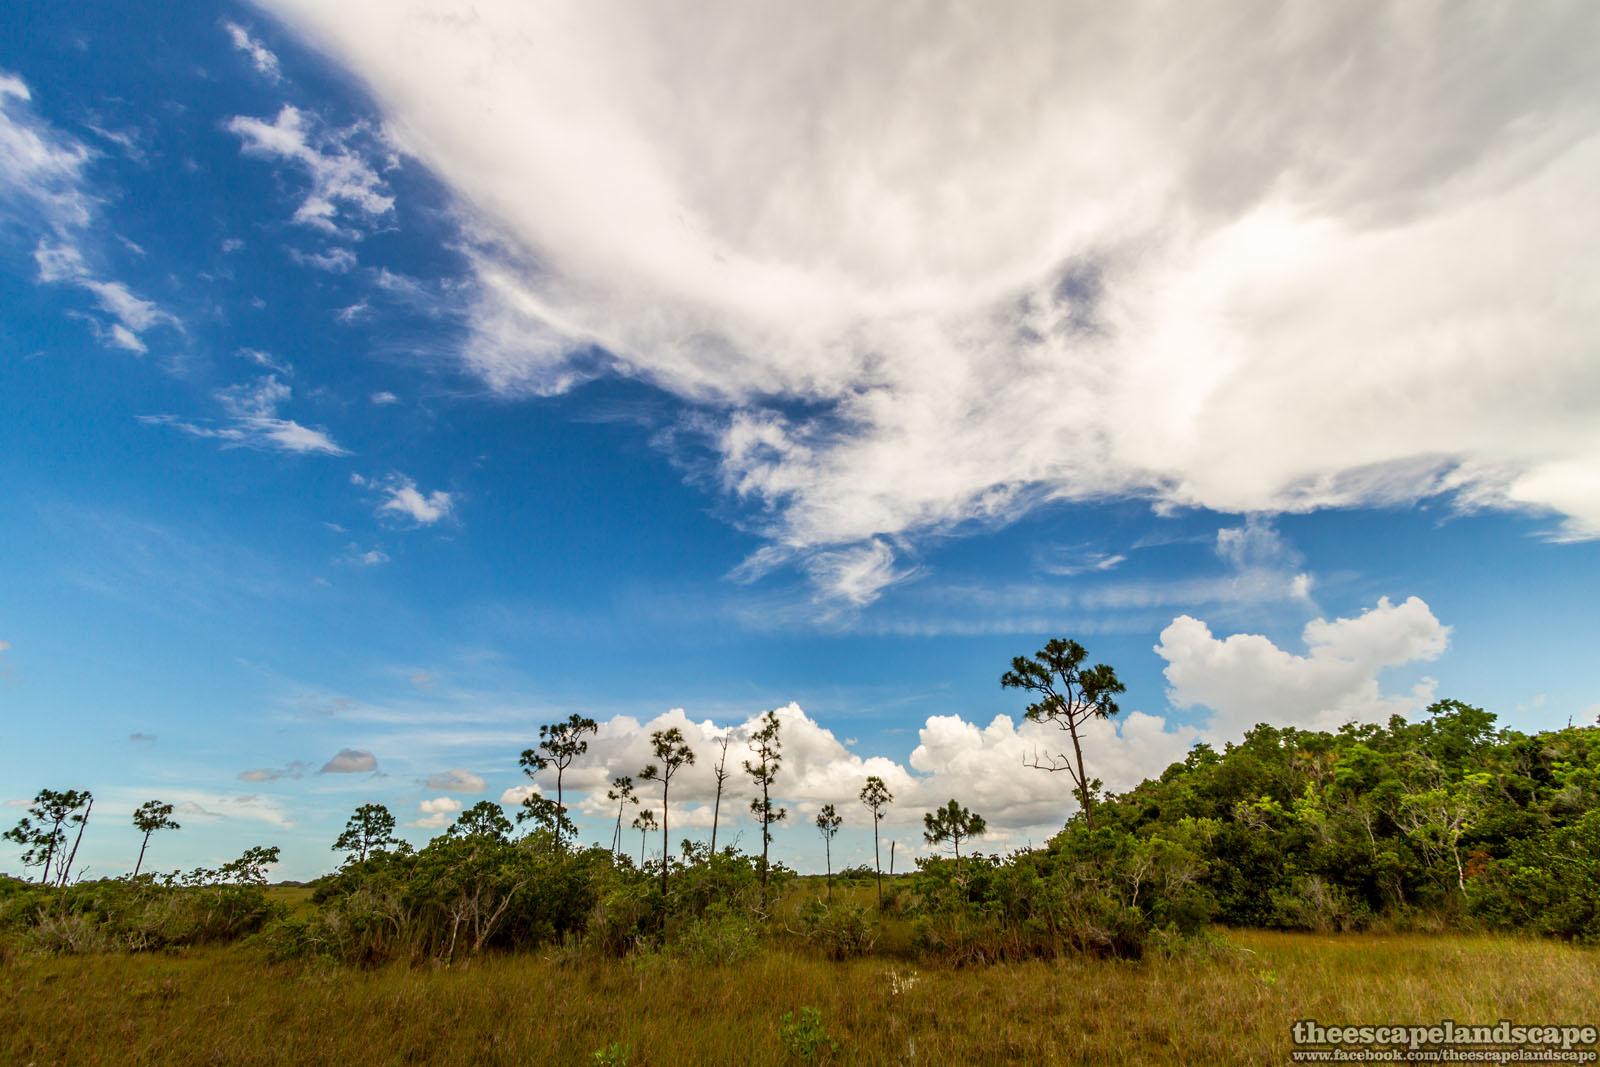 everglades_nemzeti_park_florida_08